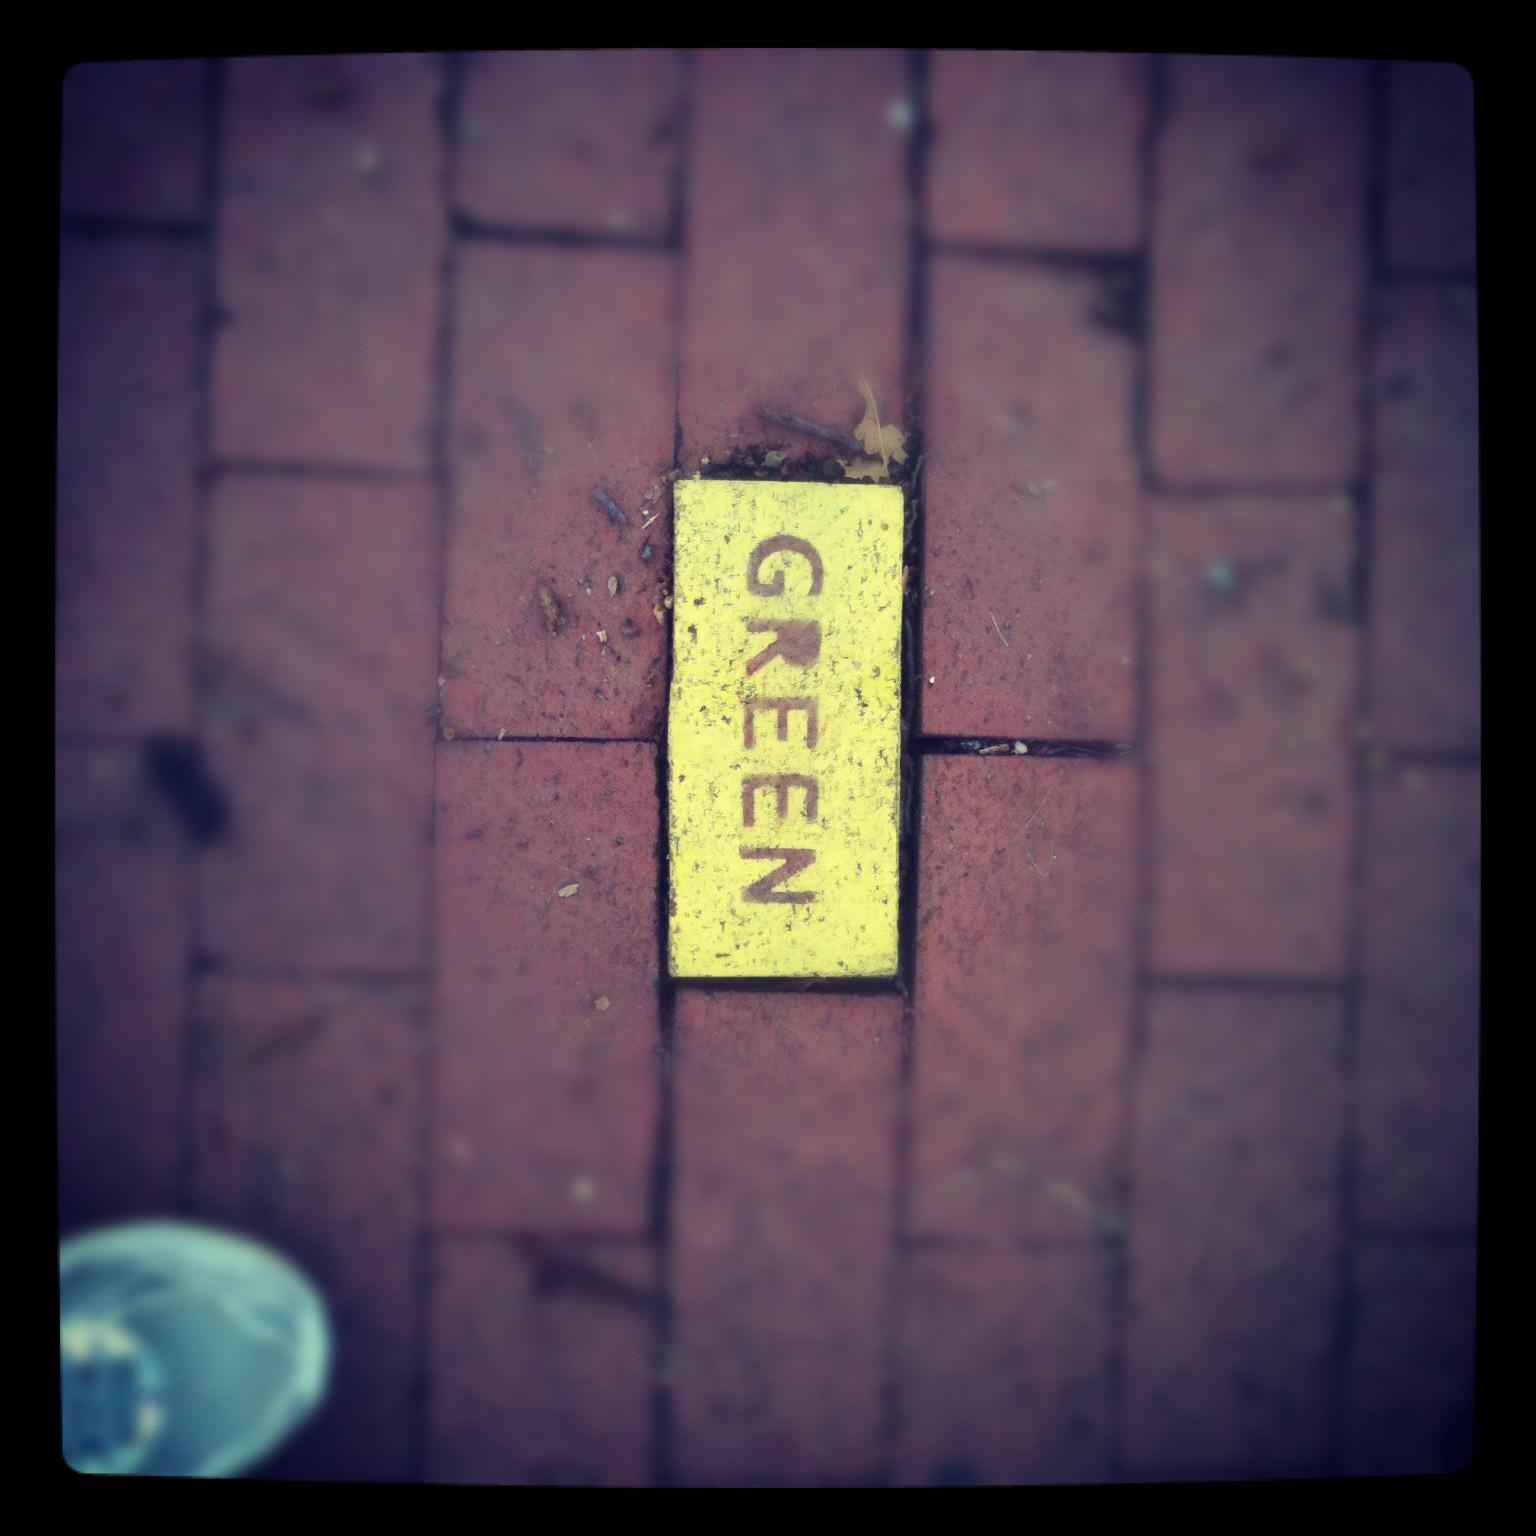 Bricks. Capitol Hill, Washington, DC, July 2012